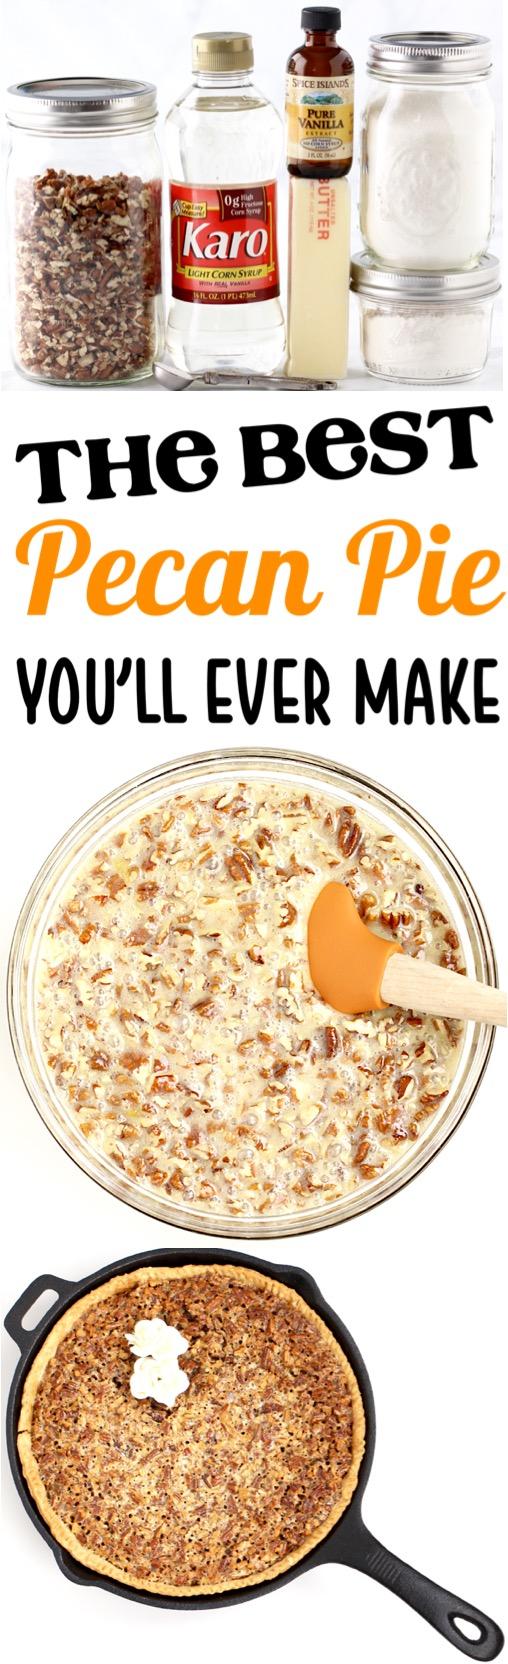 Easy Pecan Pie Recipe Simple Homemade Skillet Pies